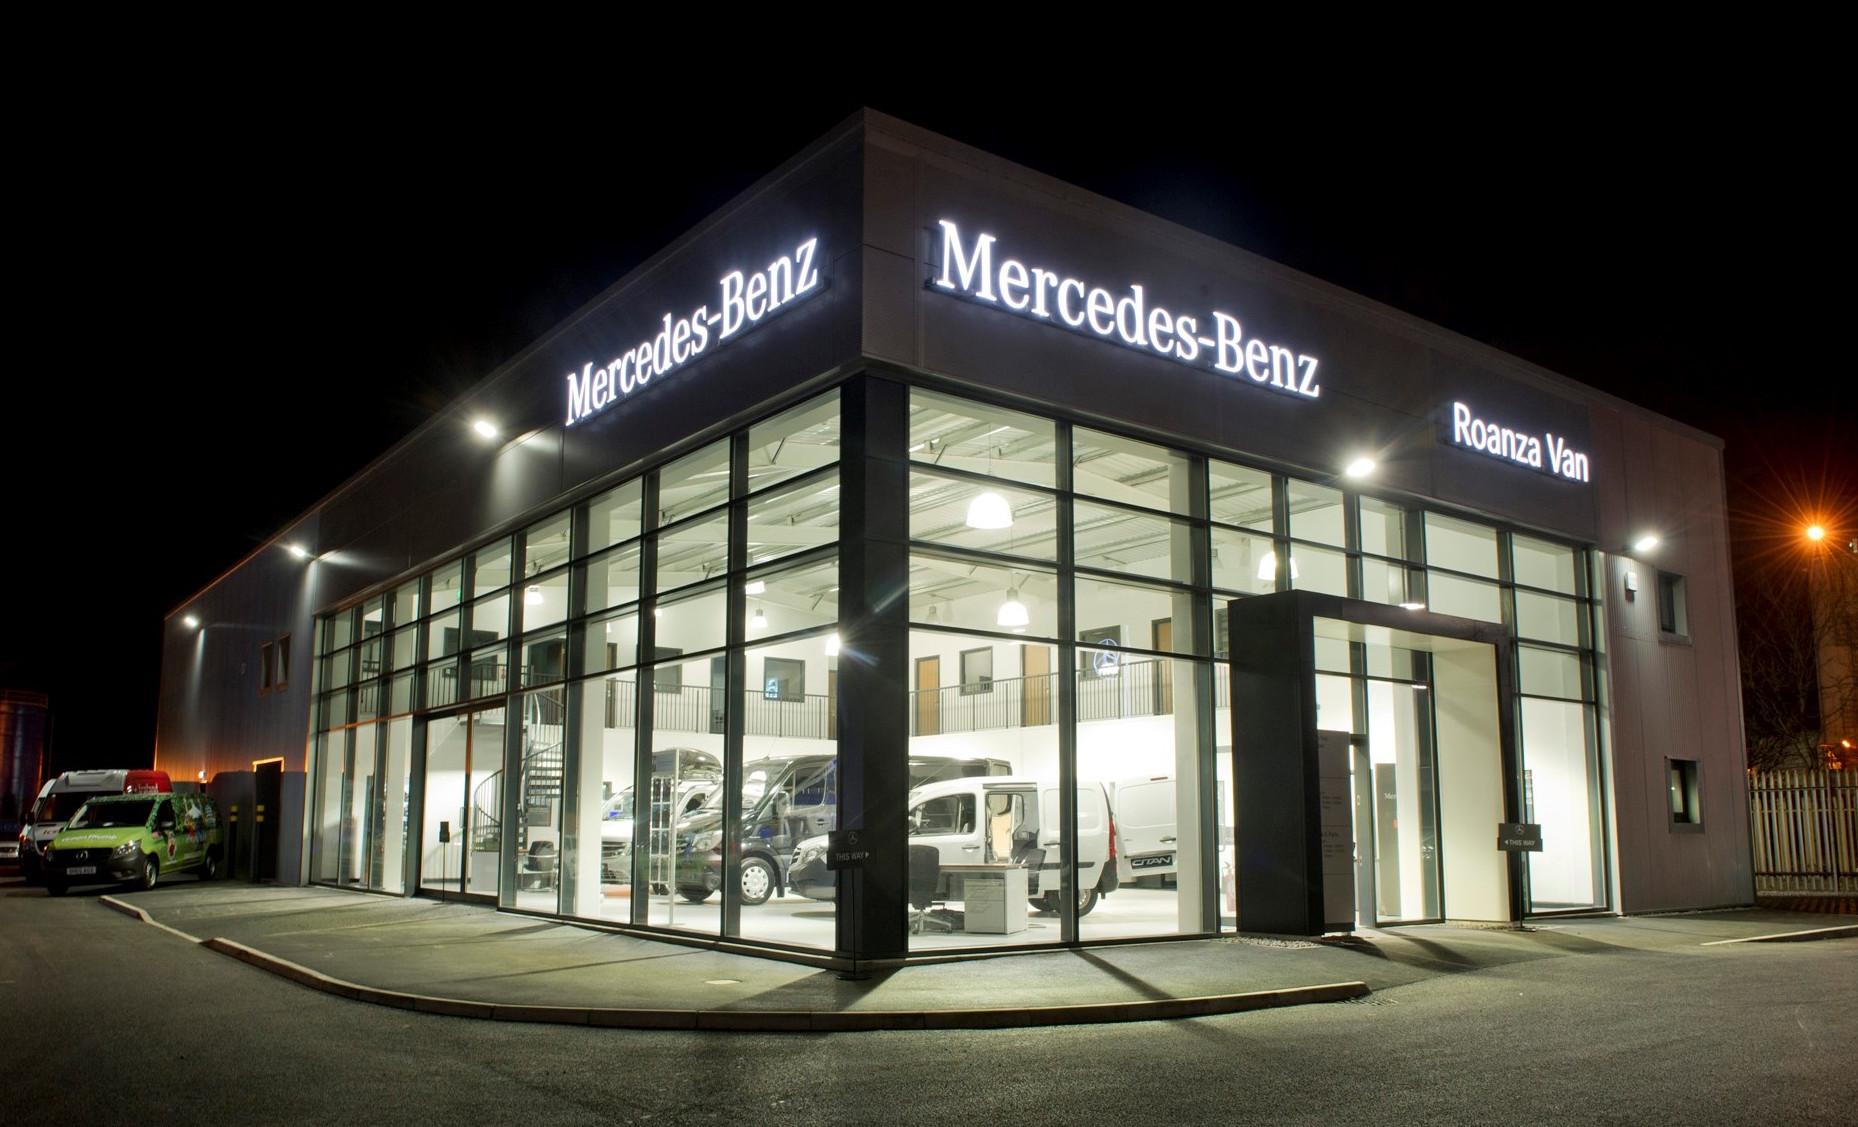 Mercedes benz dealer roanza truck van launches 1m for Mercedes benz dealer in brooklyn